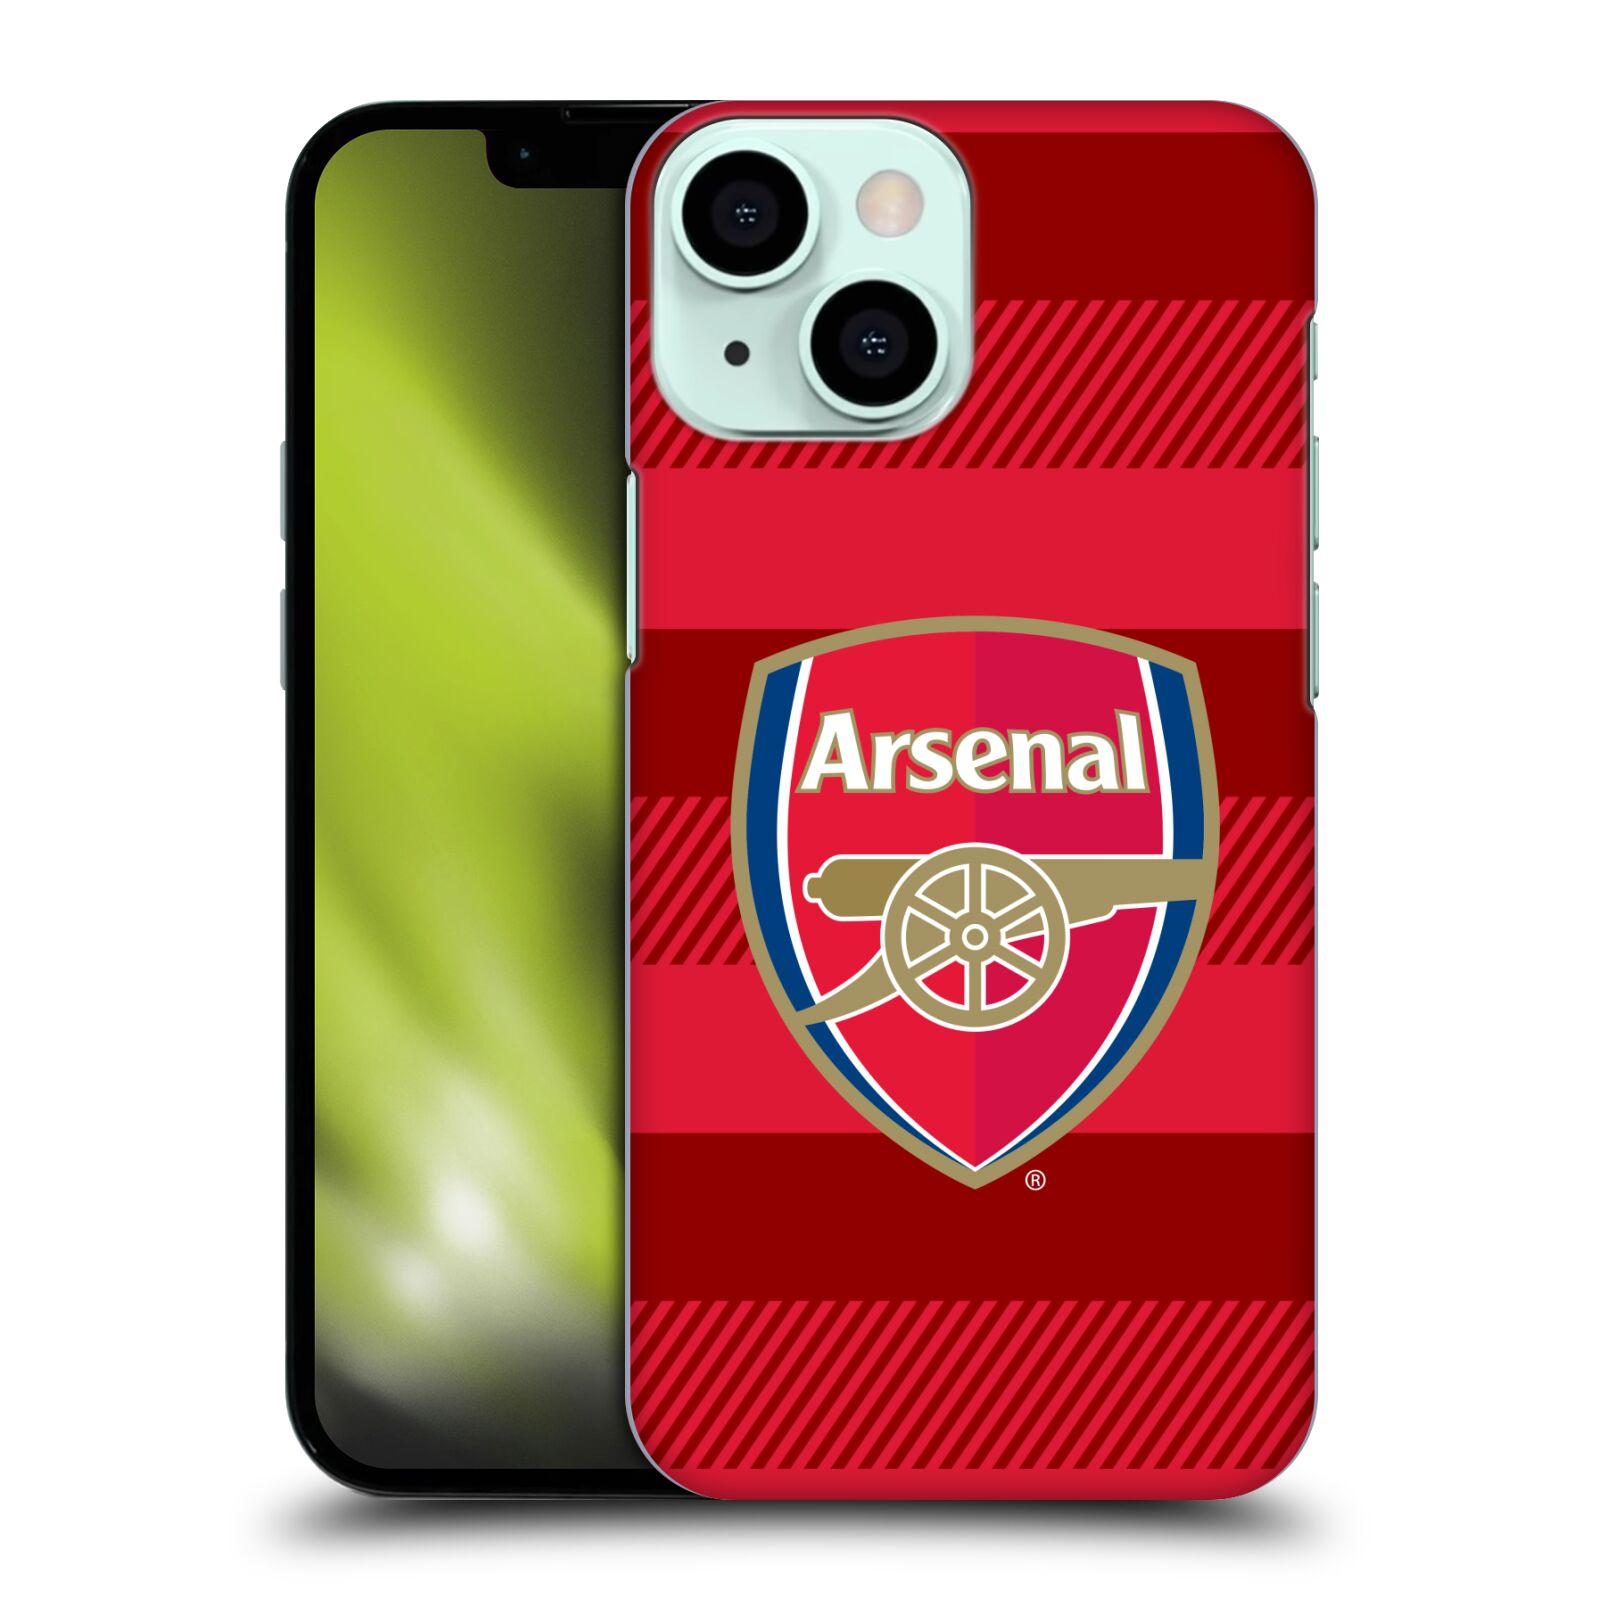 Plastové pouzdro na mobil Apple iPhone 13 Mini - Head Case - Arsenal FC - Logo s pruhy